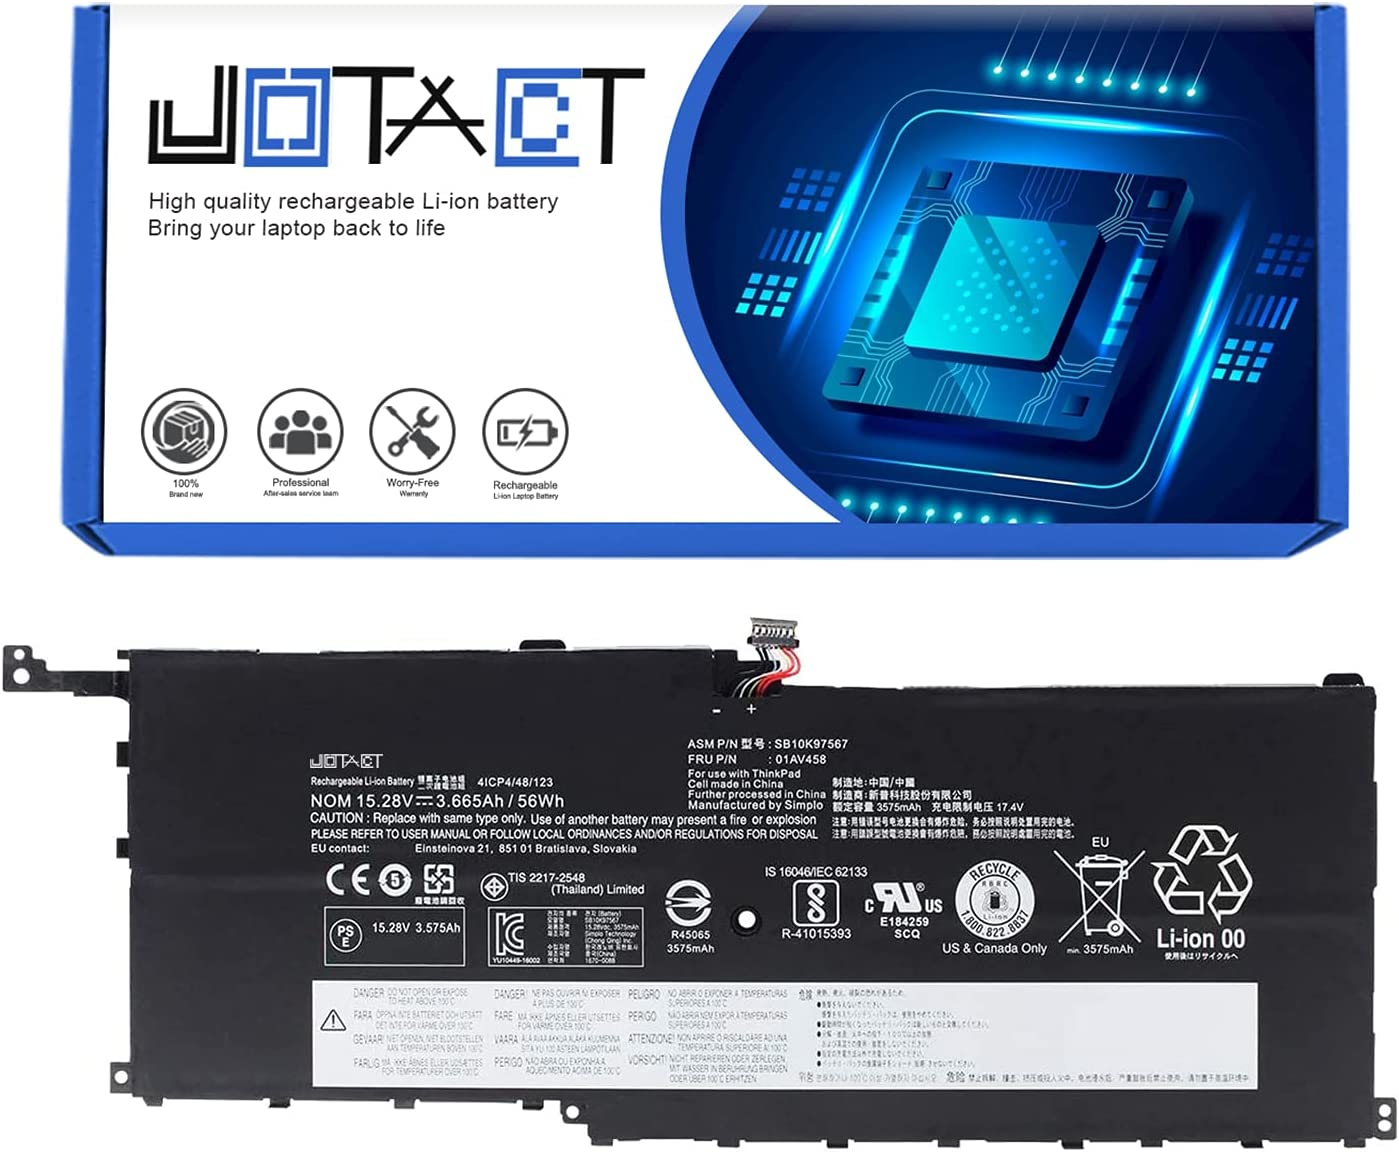 JOTACT 01AV458 Max 72% OFF SB10K97567 15.28V 56Wh R 3665mAh Laptop Battery Max 64% OFF